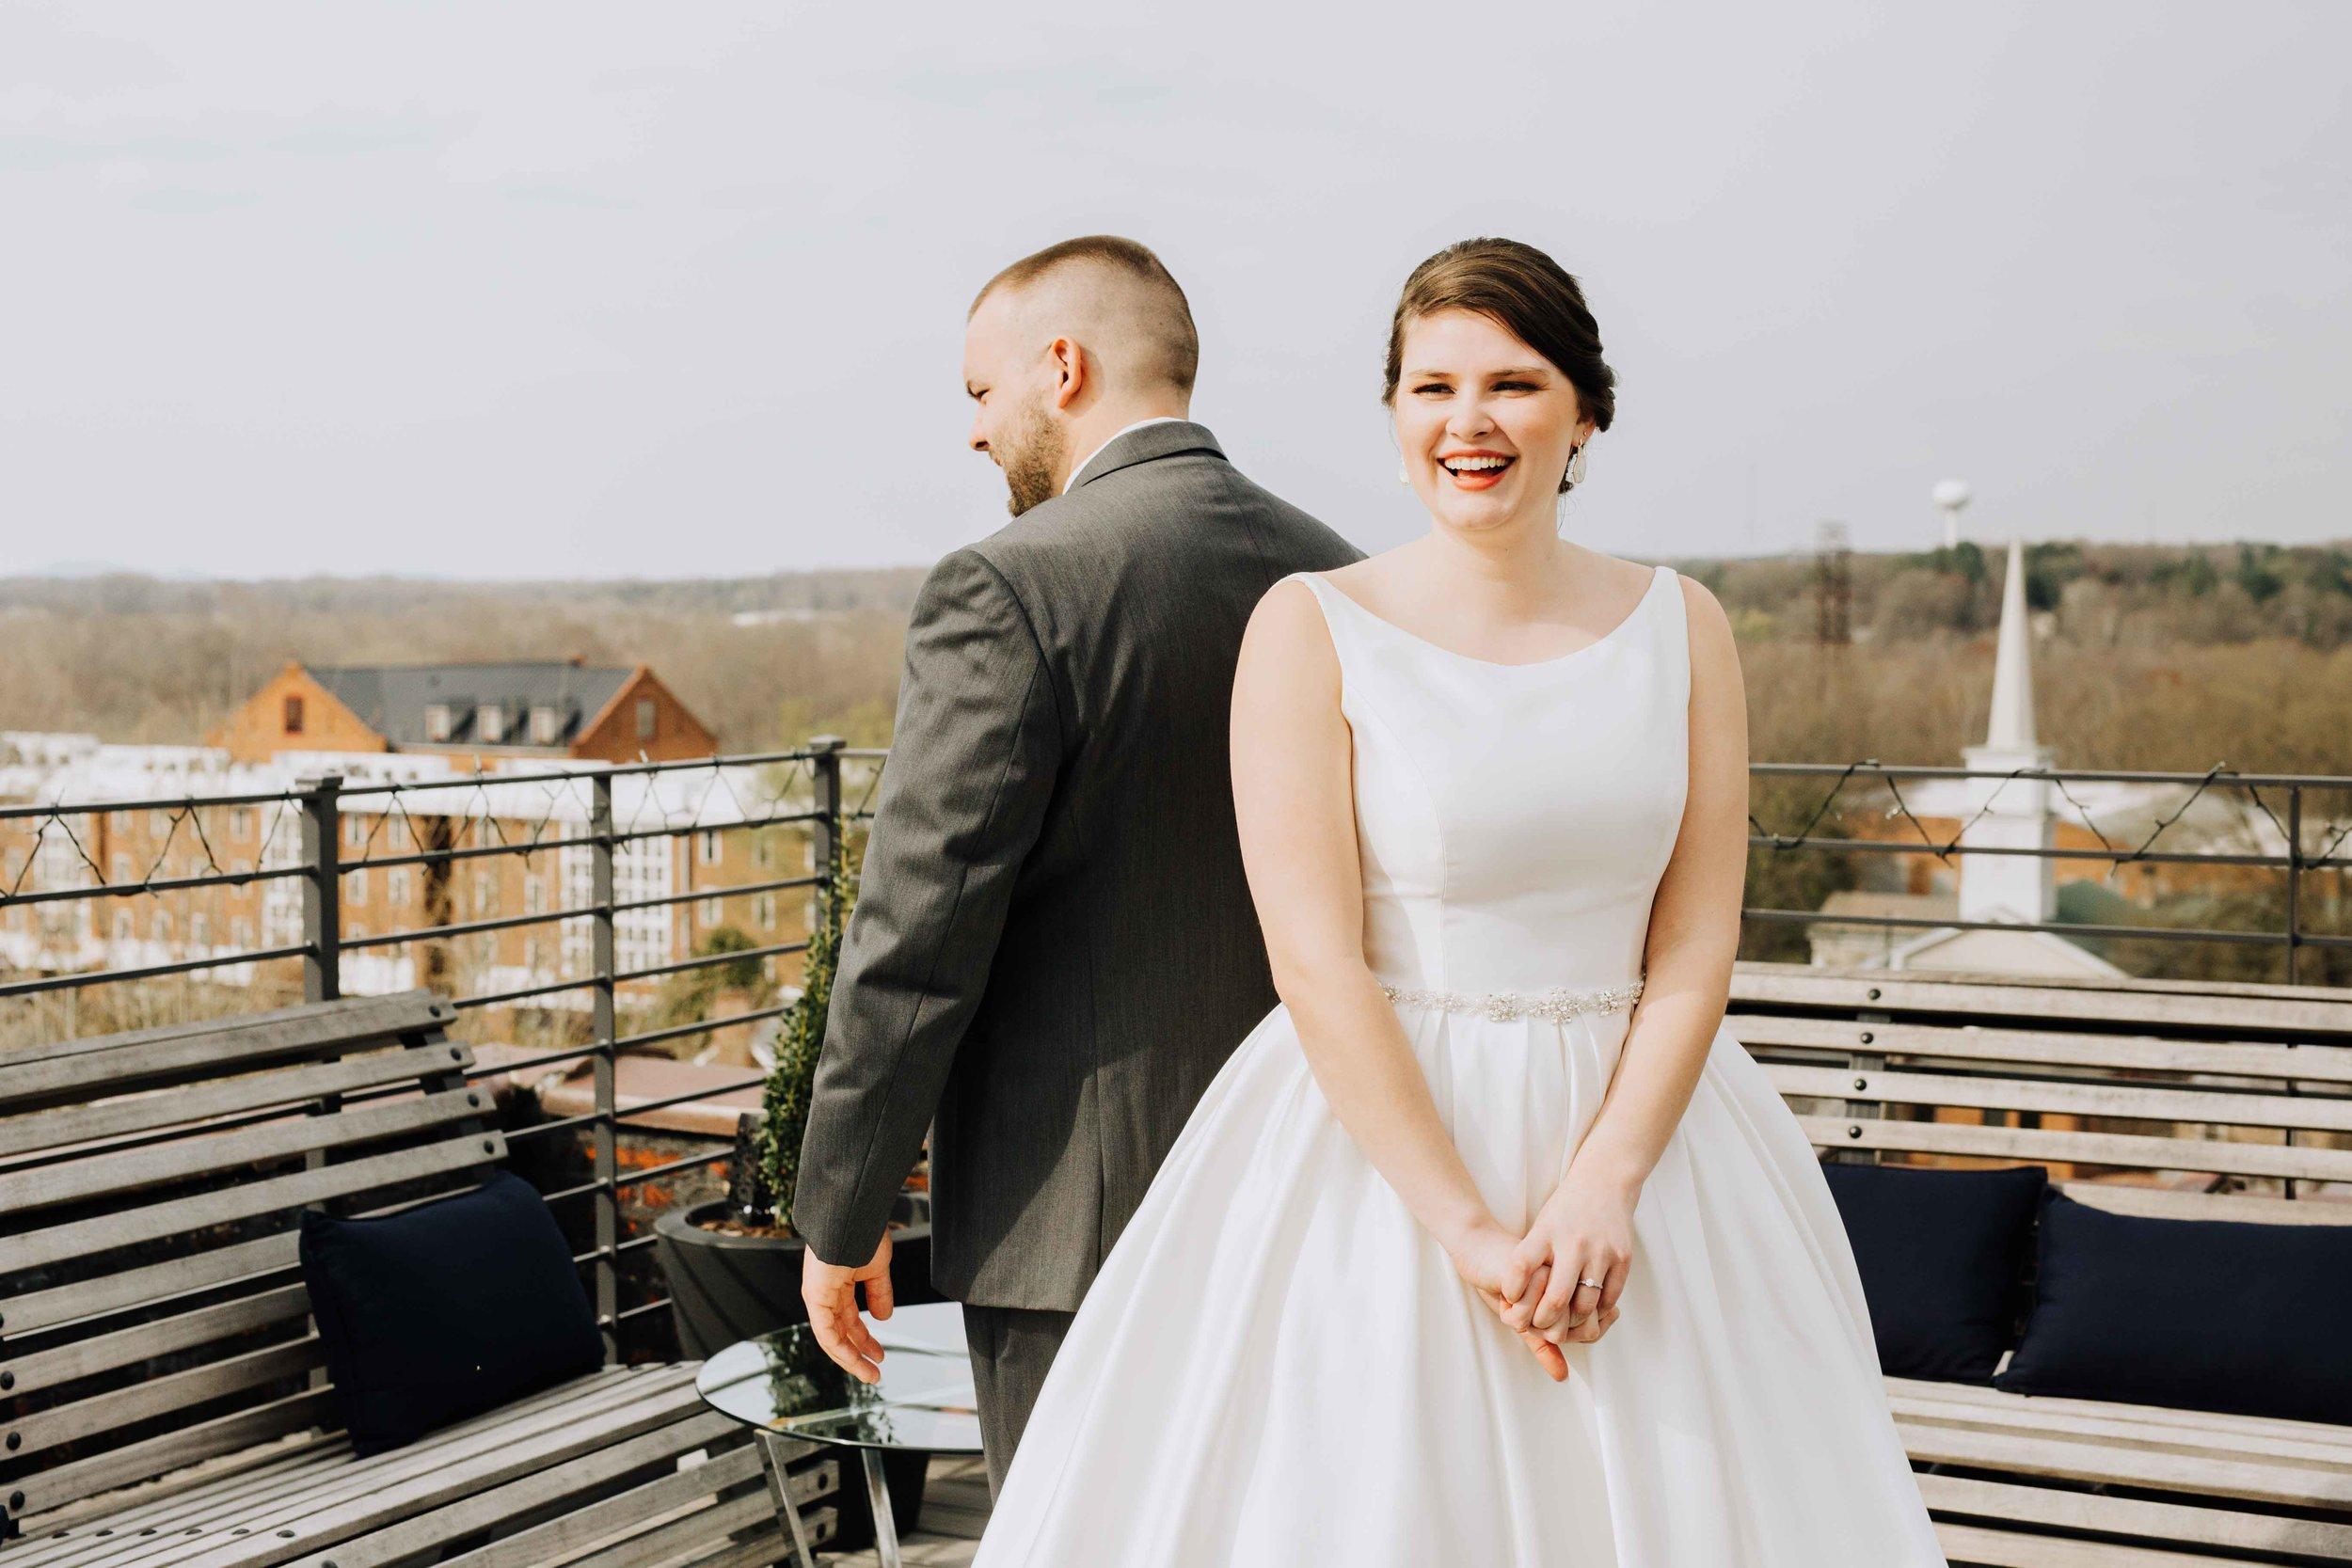 Farmville-Virginia-Wedding-Hotel-Weynoke-Downtown-Jacqueline-Waters-Photography-Detailed- (557).jpg